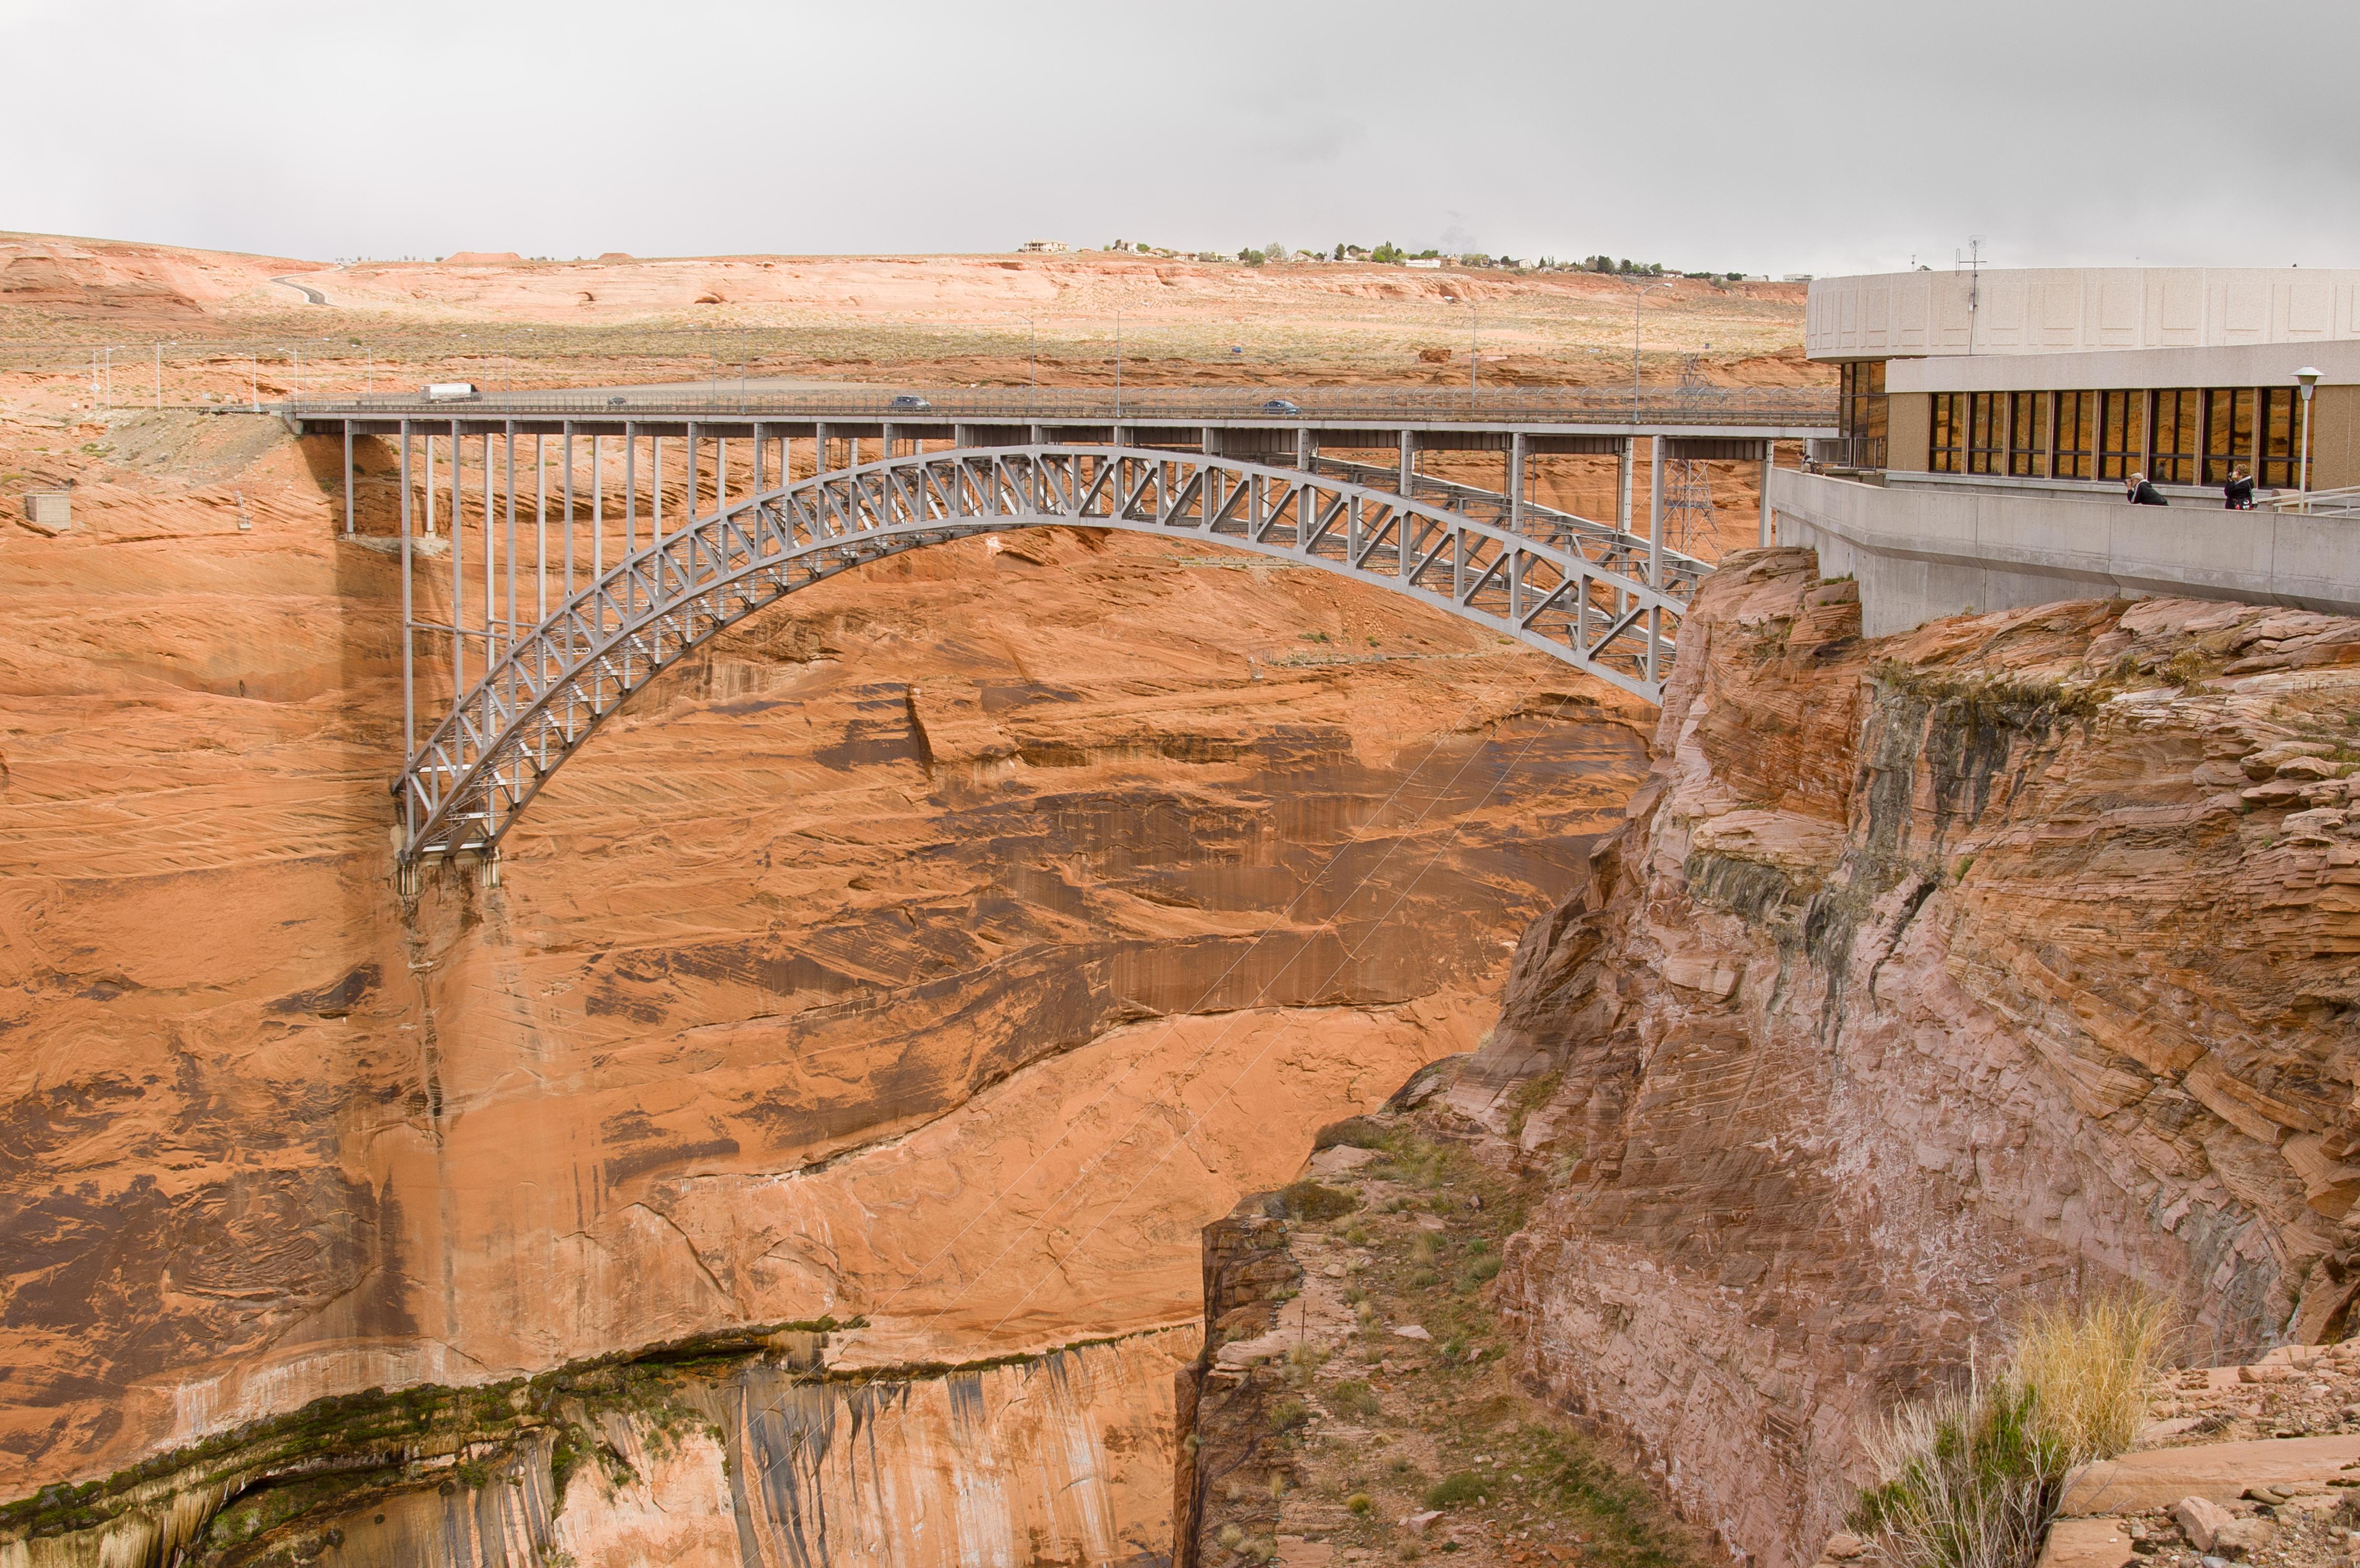 File:Glen Canyon Bridge and Visitor Center.jpg - Wikimedia Commons